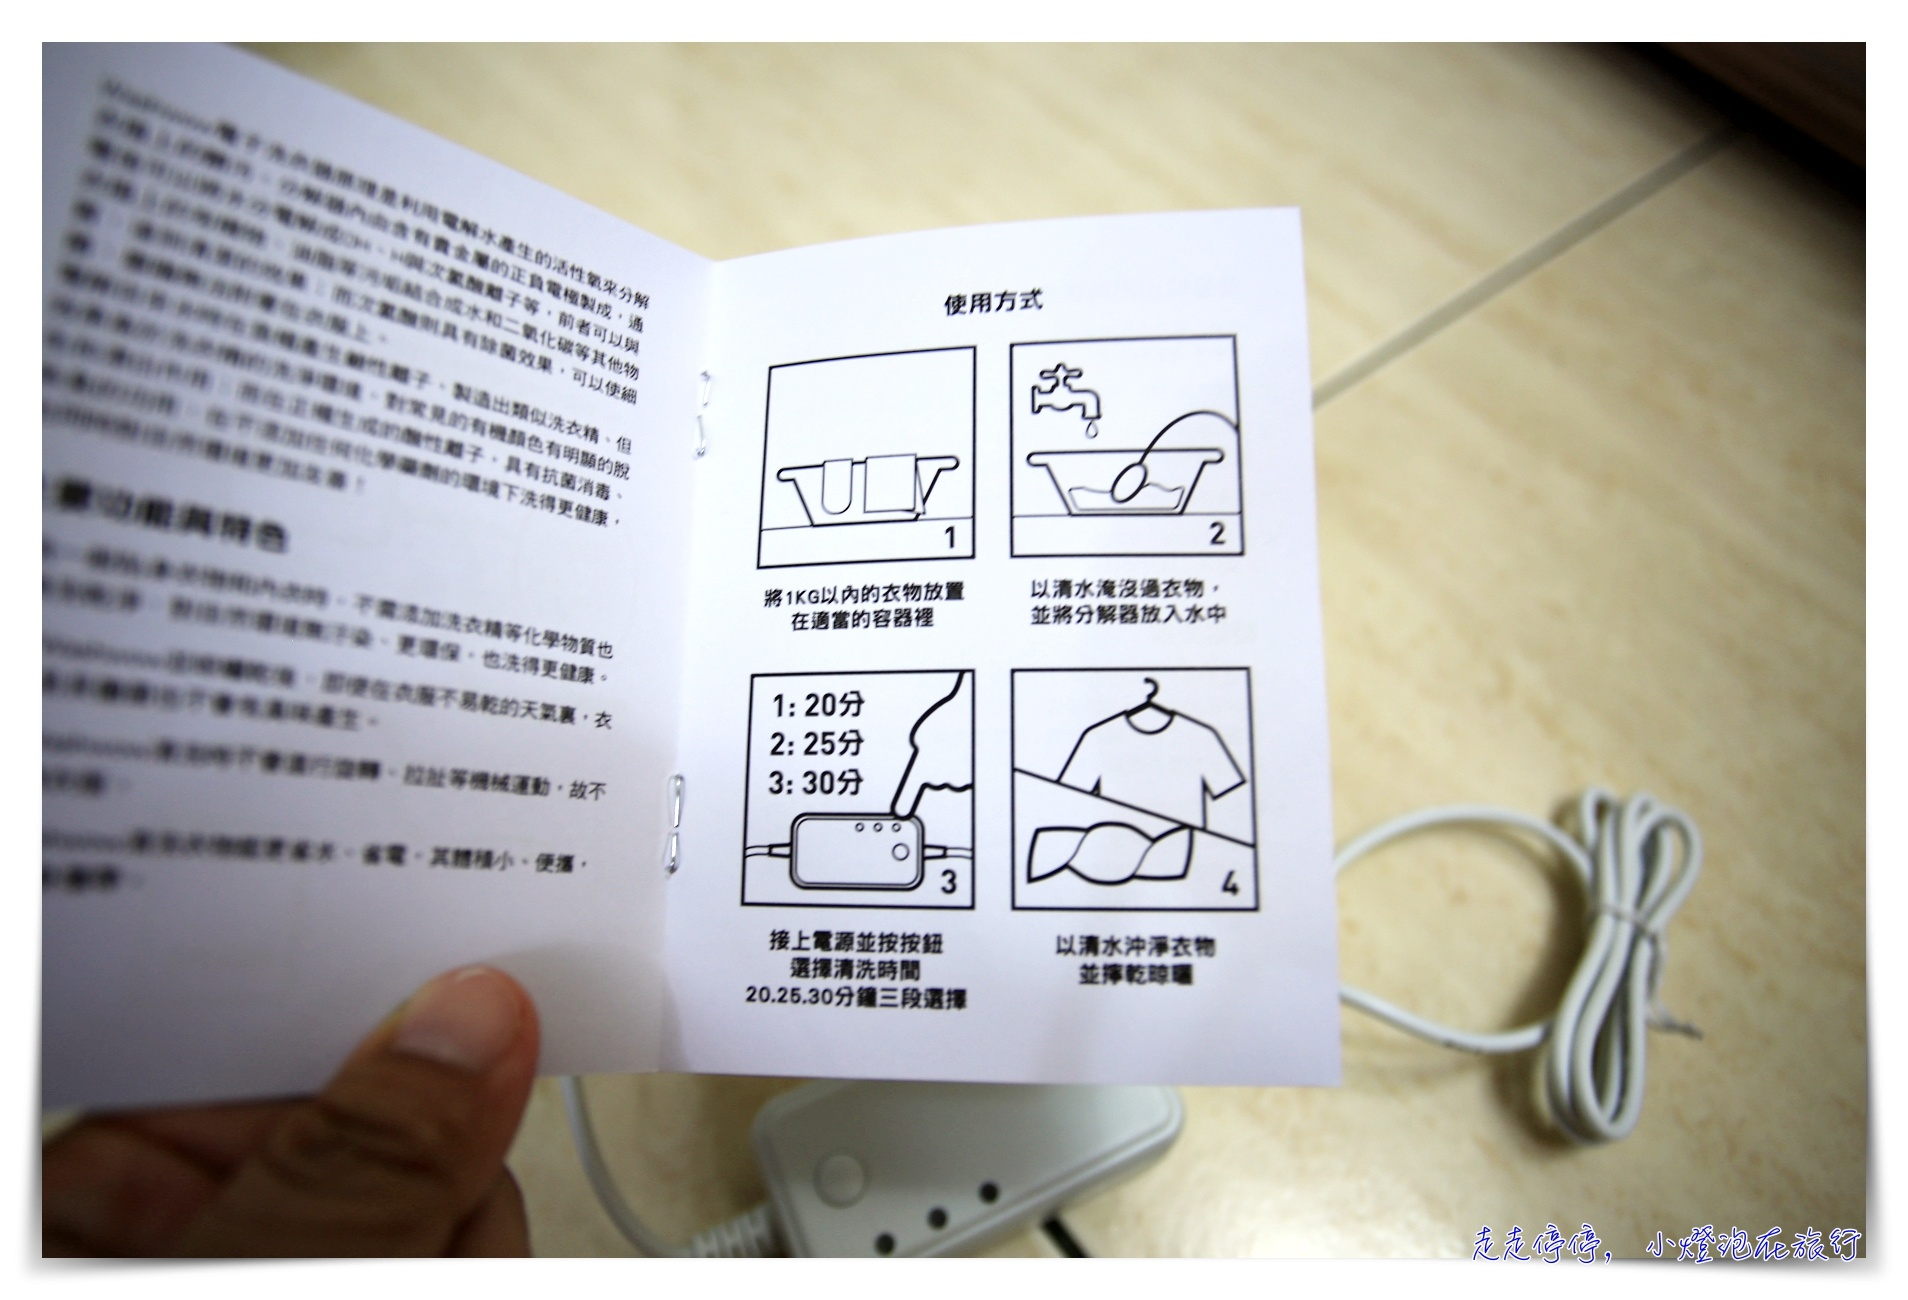 Washwow|微型洗衣機+Dry Angel旅行烘乾機、旅行洗衣好幫手,不用洗衣粉、最新科技不用擔心洗不乾淨了~